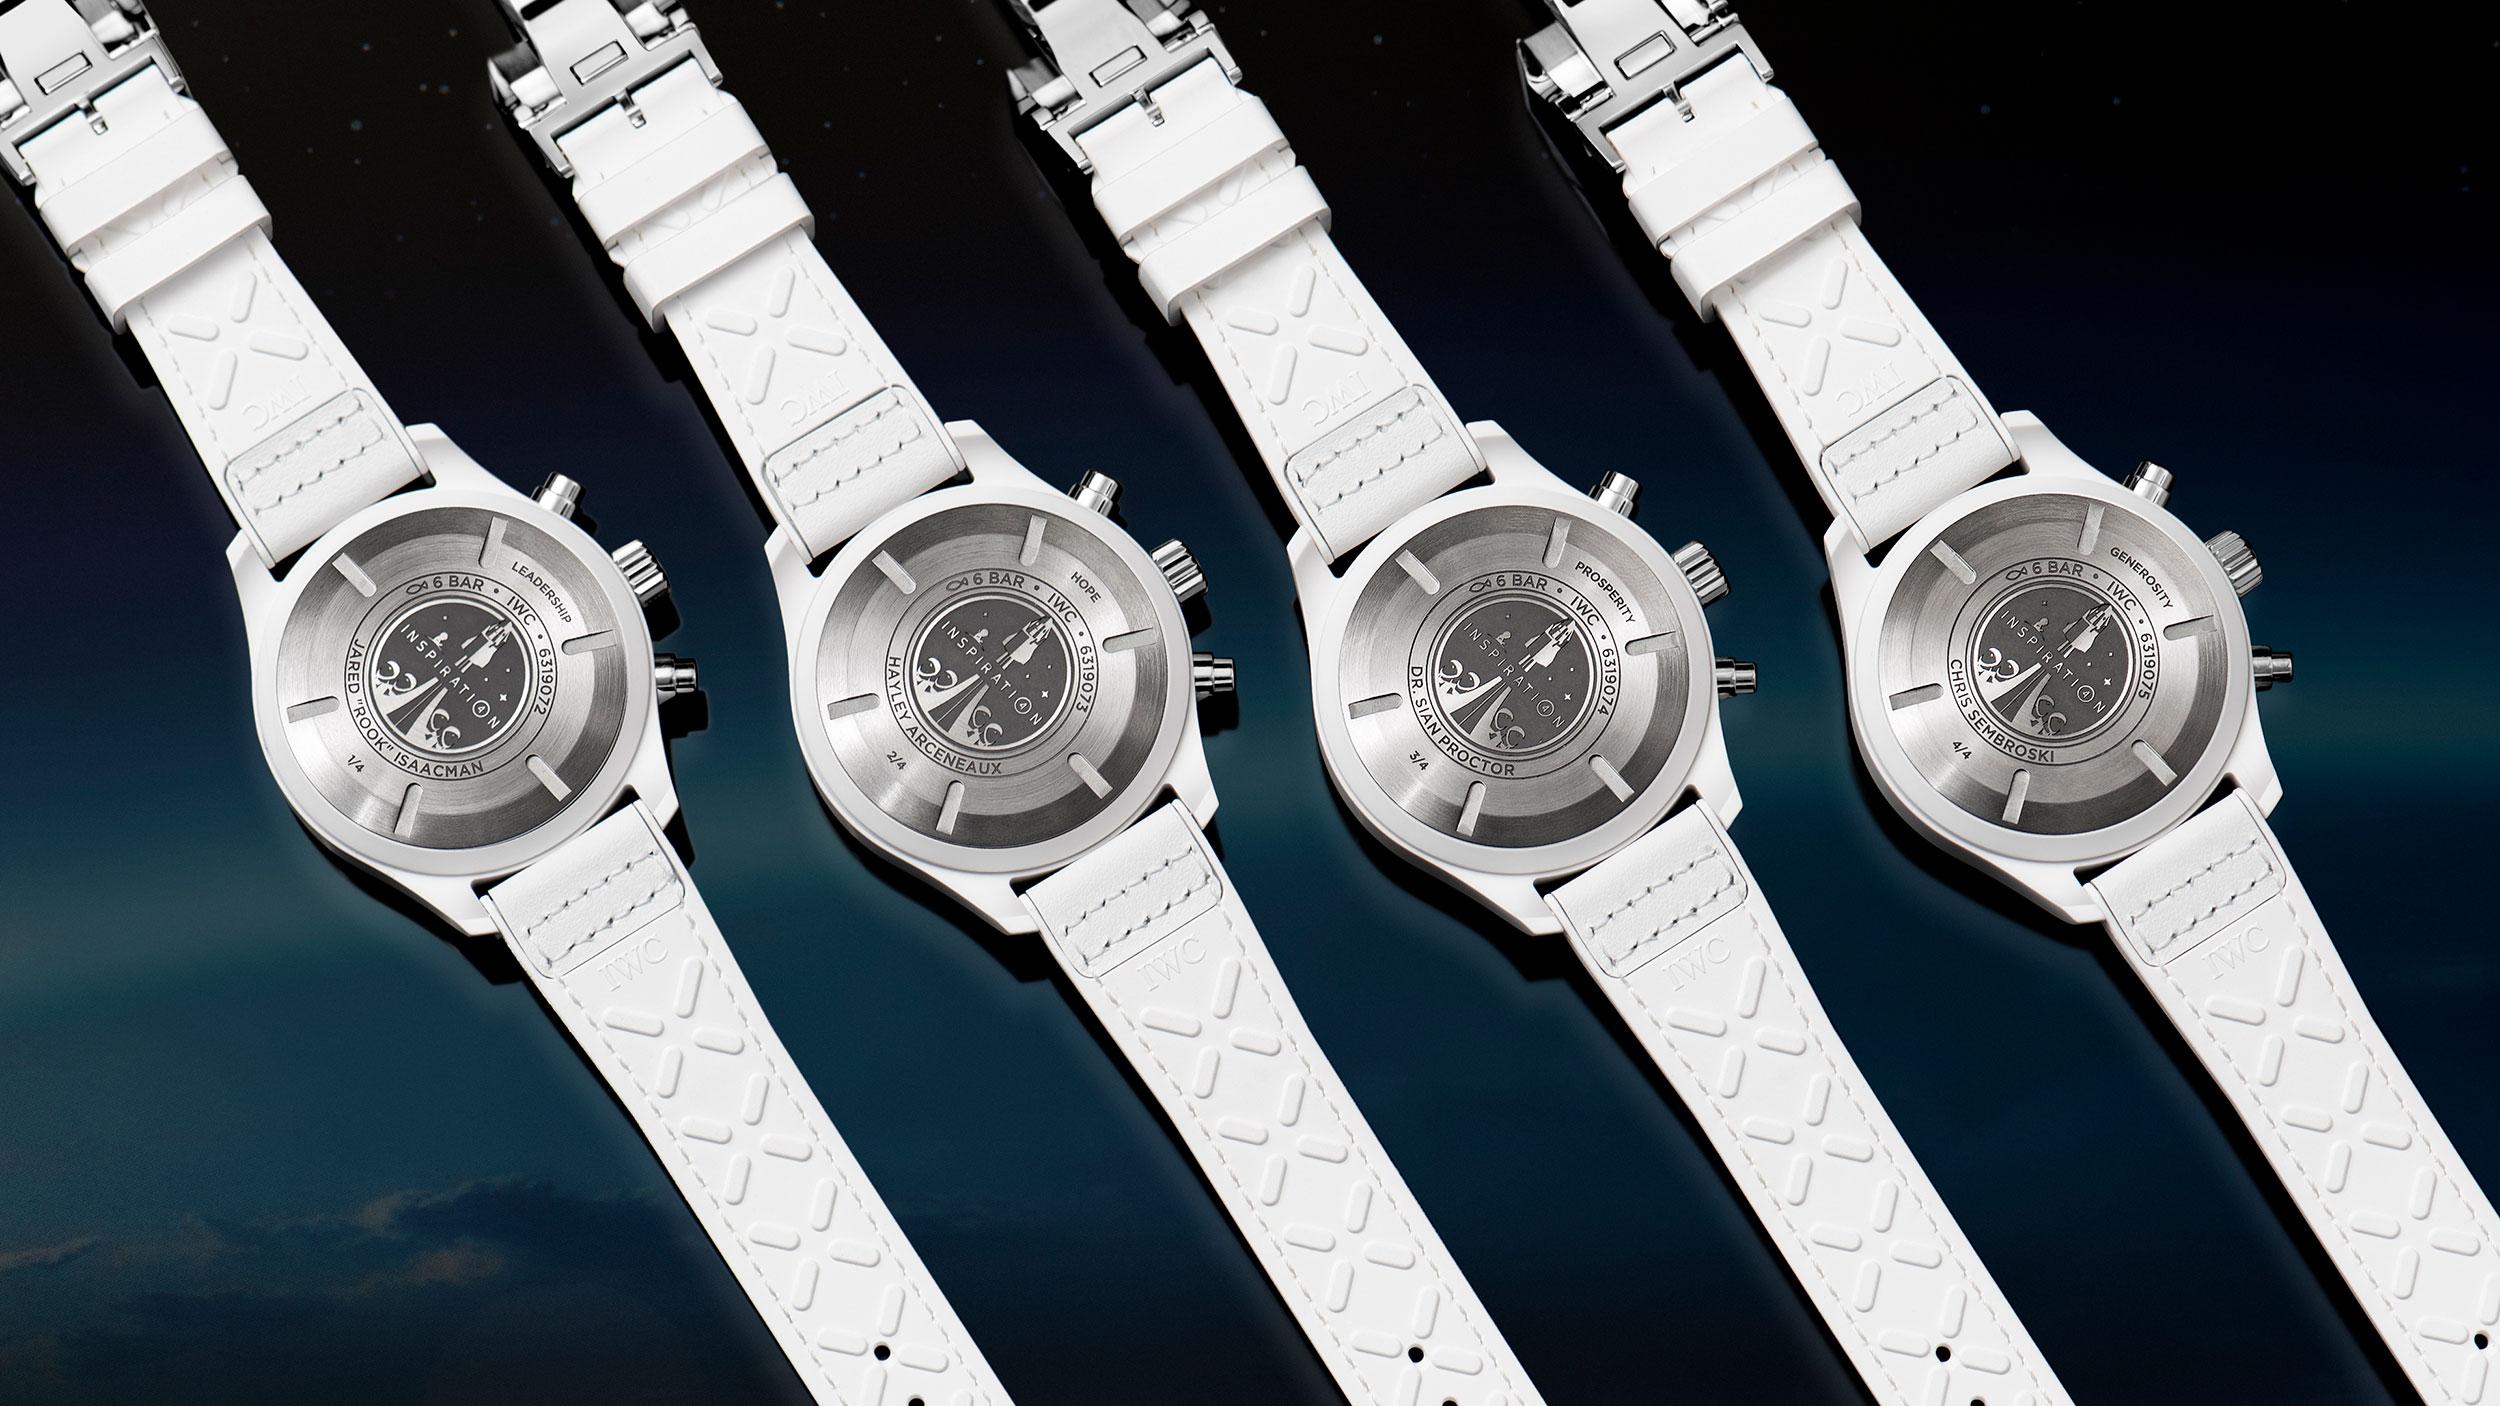 Los cuatro IWC Inspiration4 Chronograph